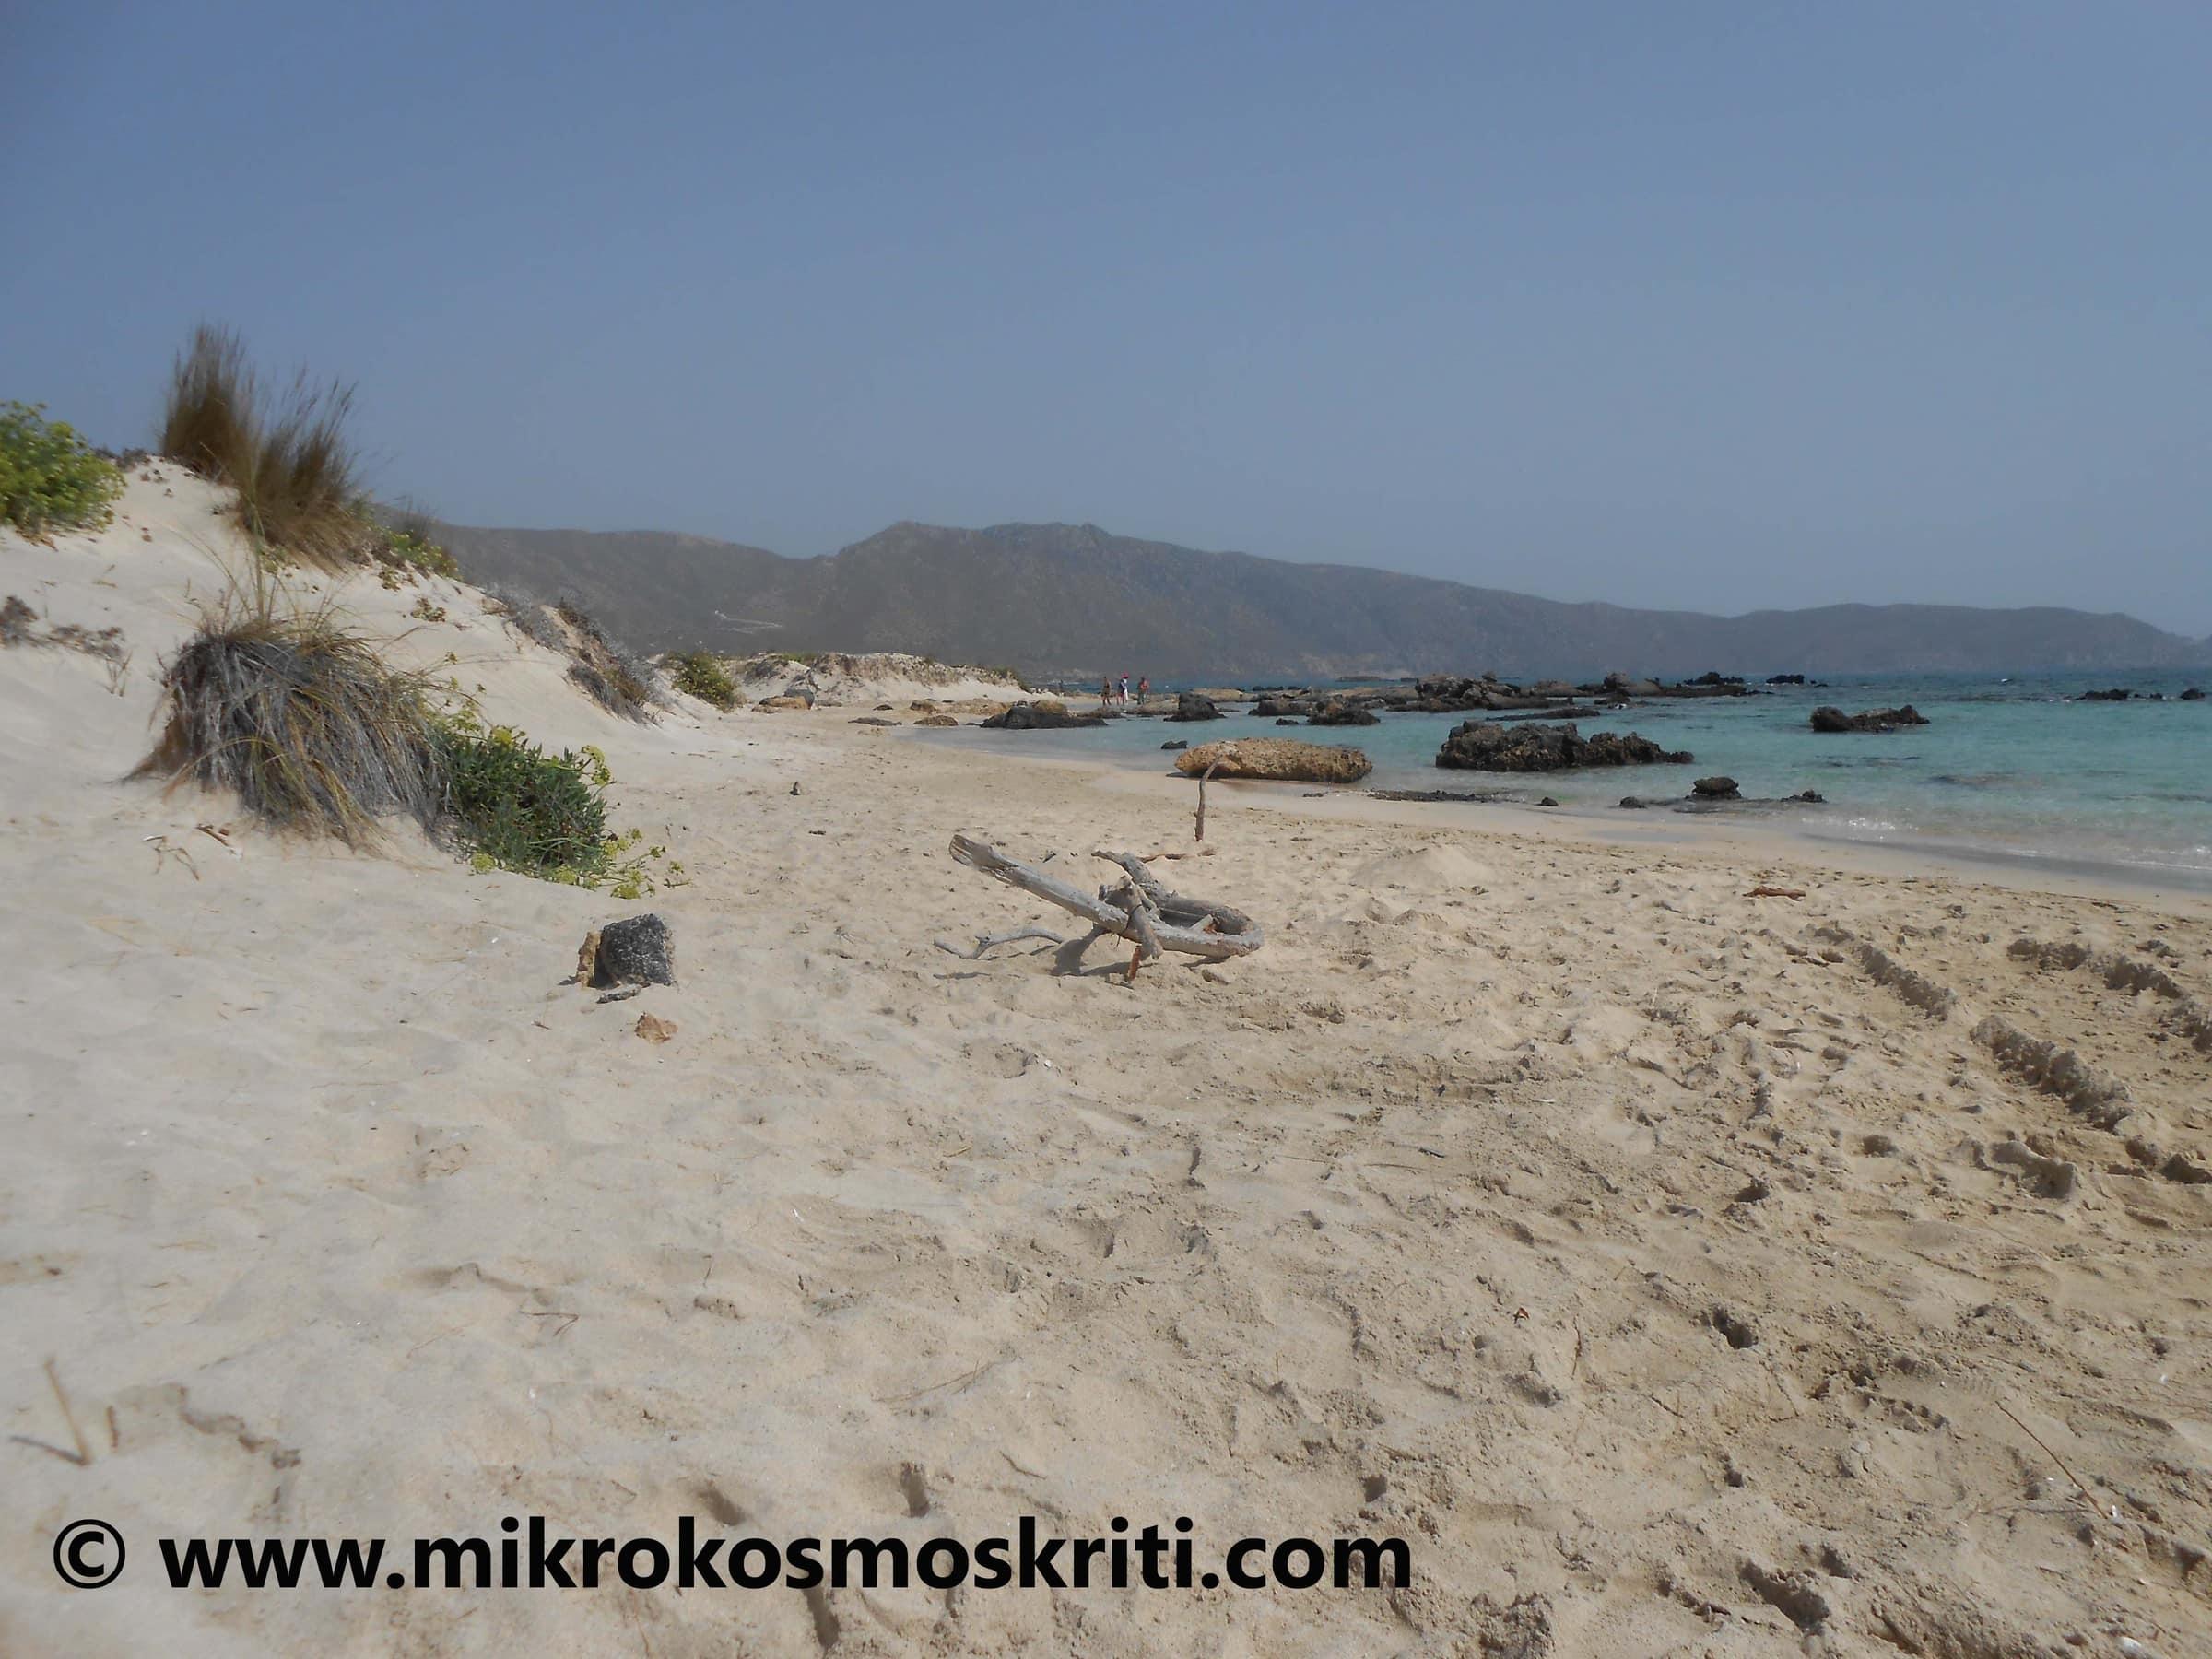 La paradisiaca spiaggia di Elafonissi